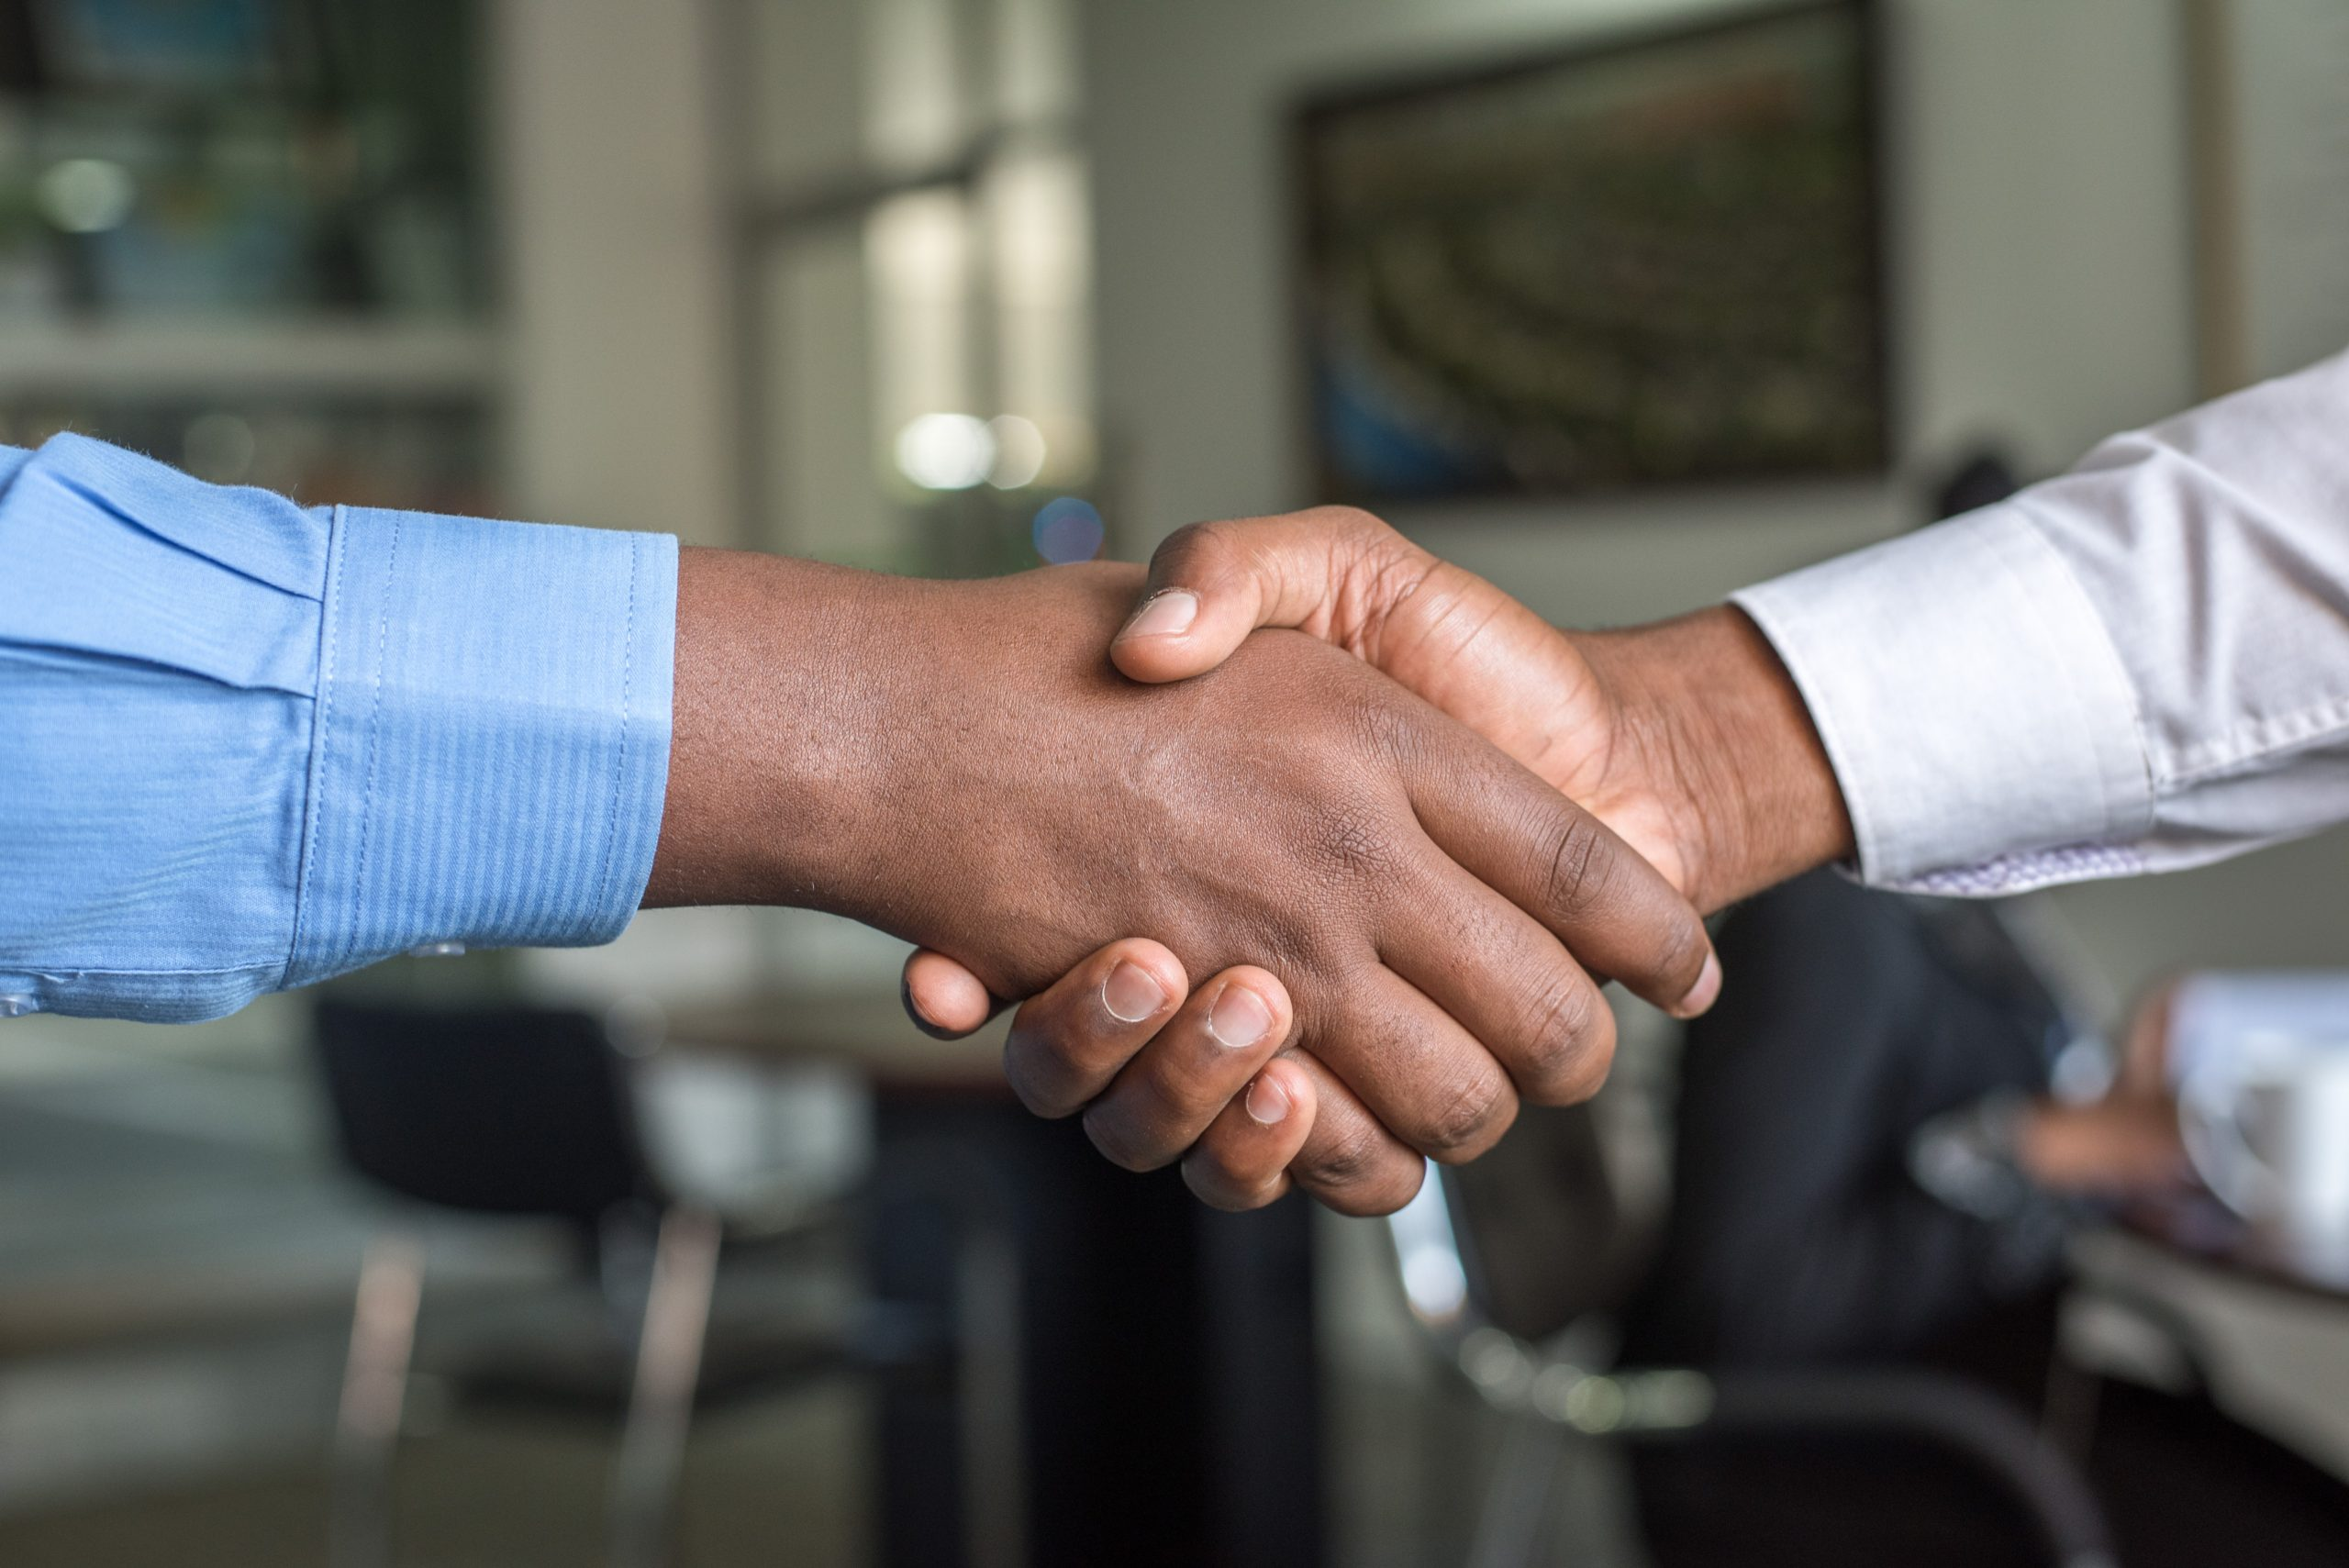 BellTower Secures over $20.8 Million in Rebuild Florida Grant Awards for Clients